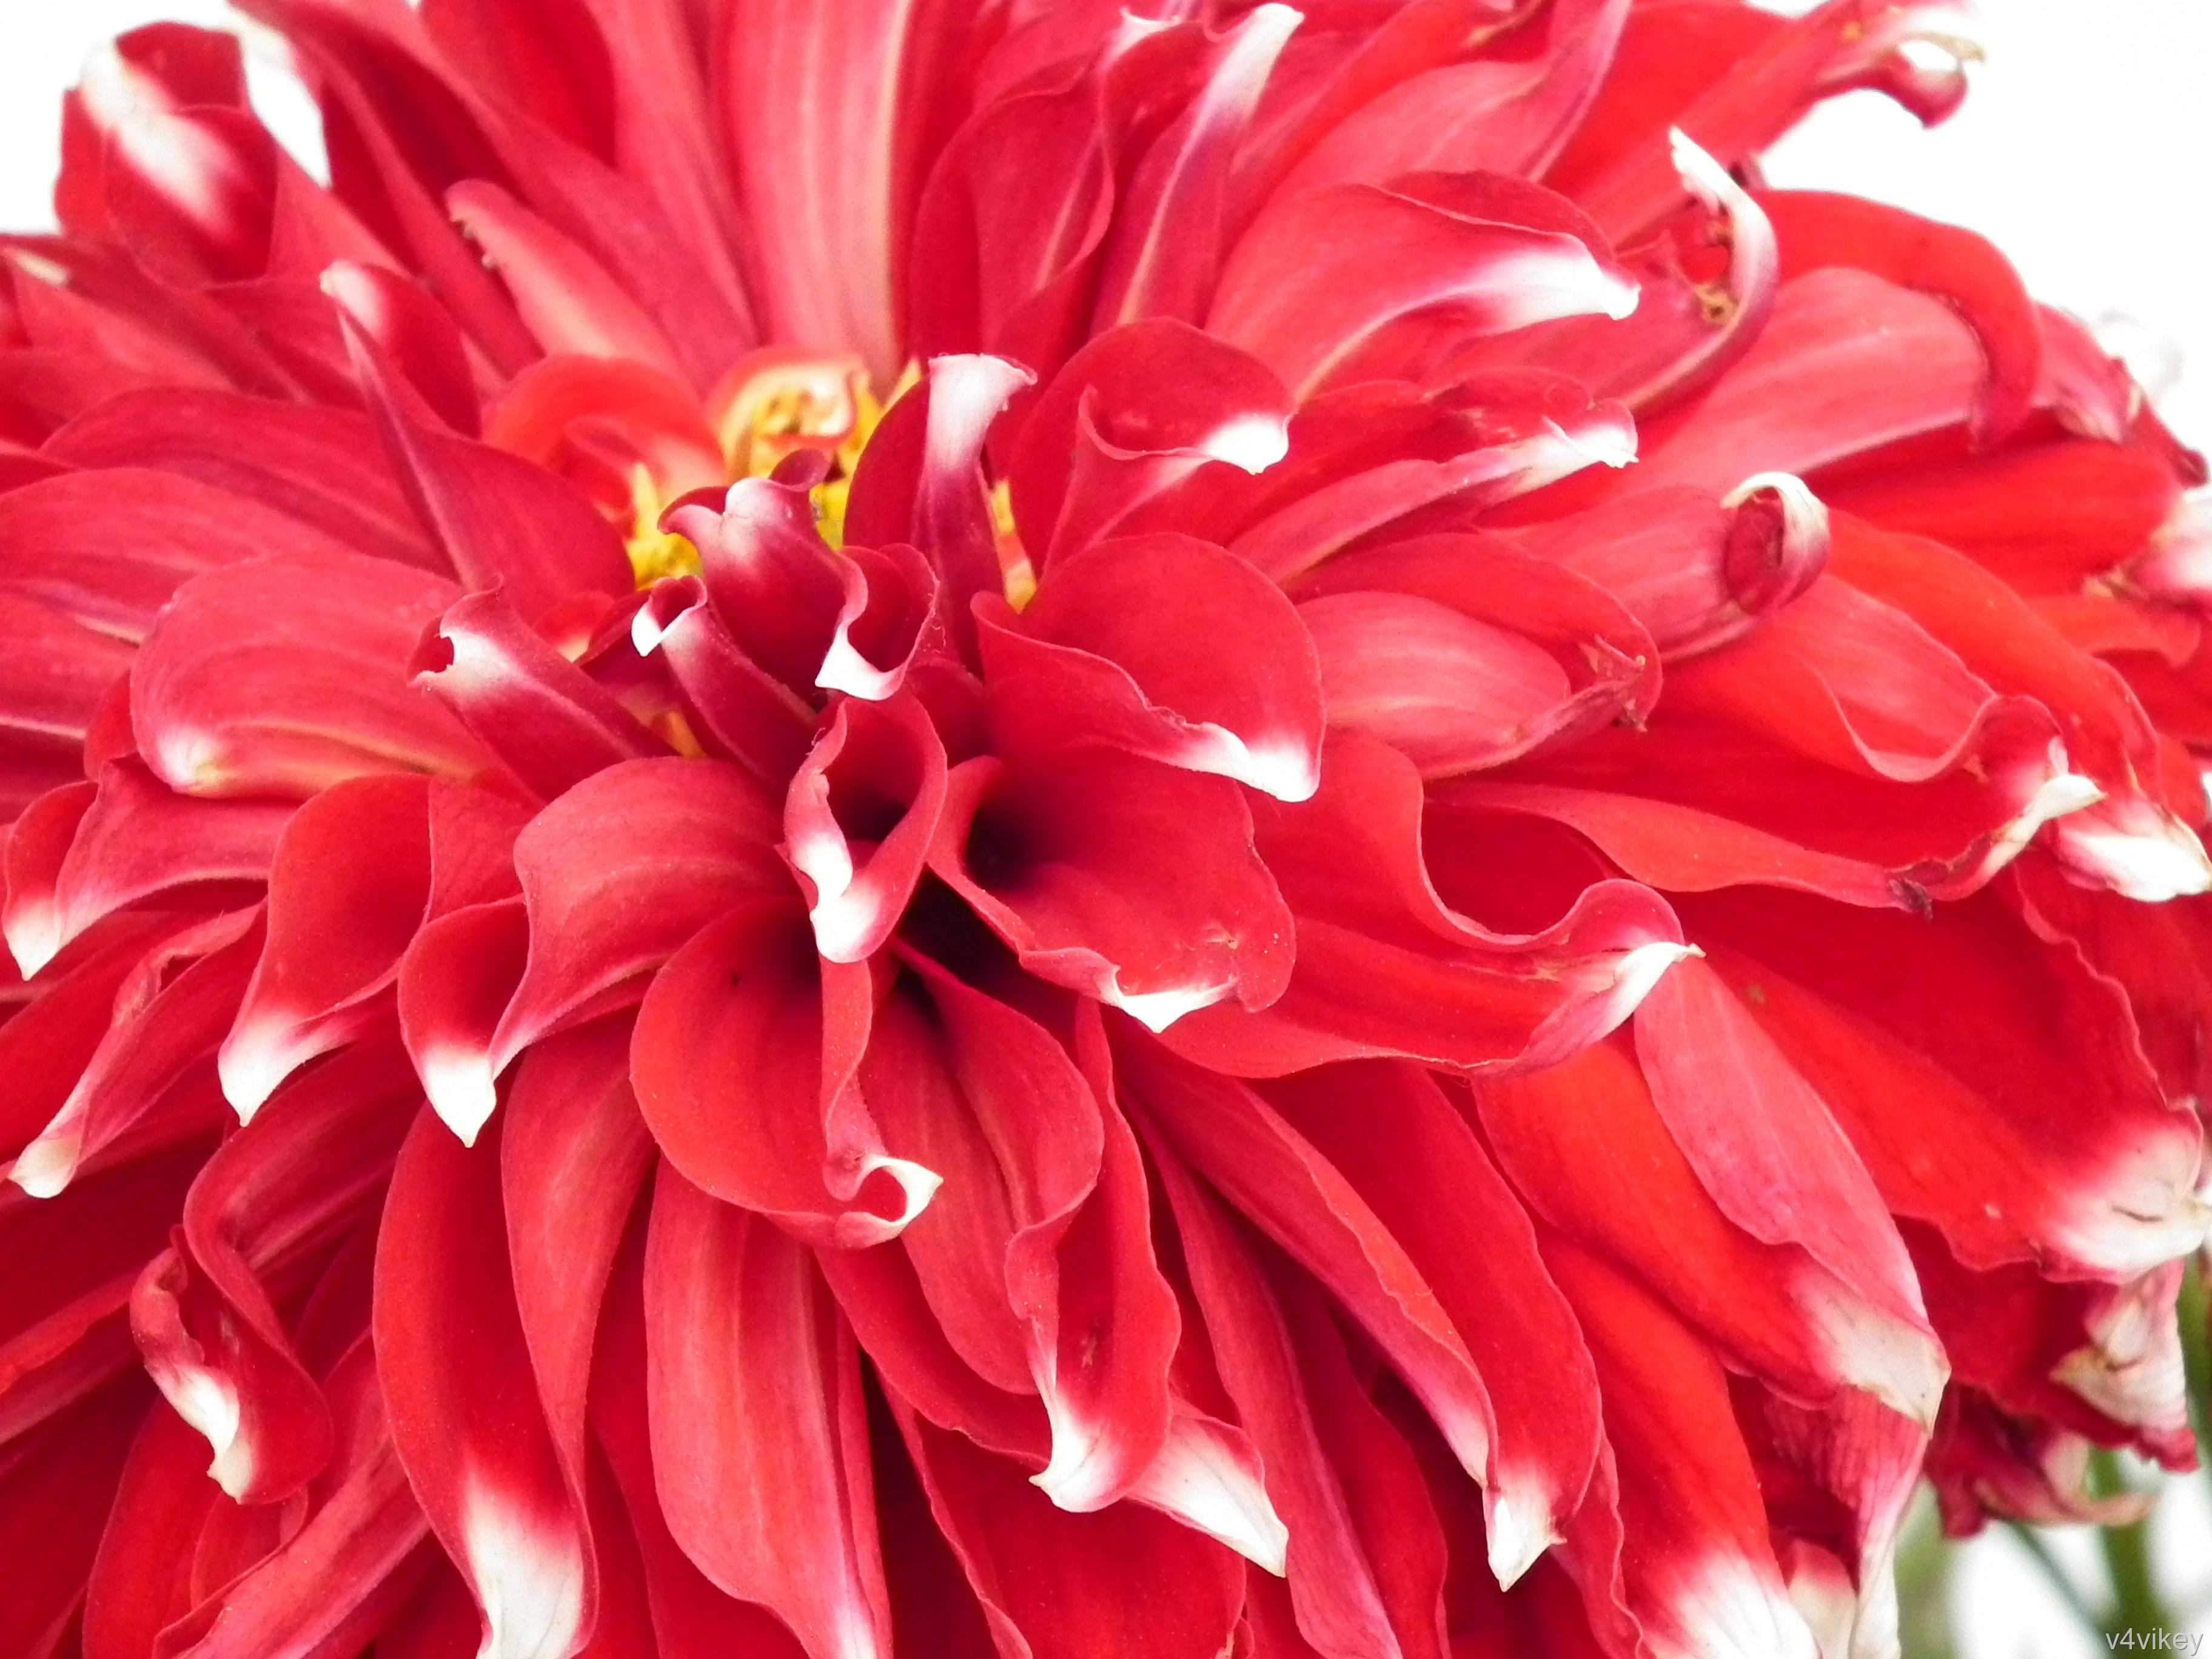 A La Mode Red Dahlia Flower Wallpaper Tadka